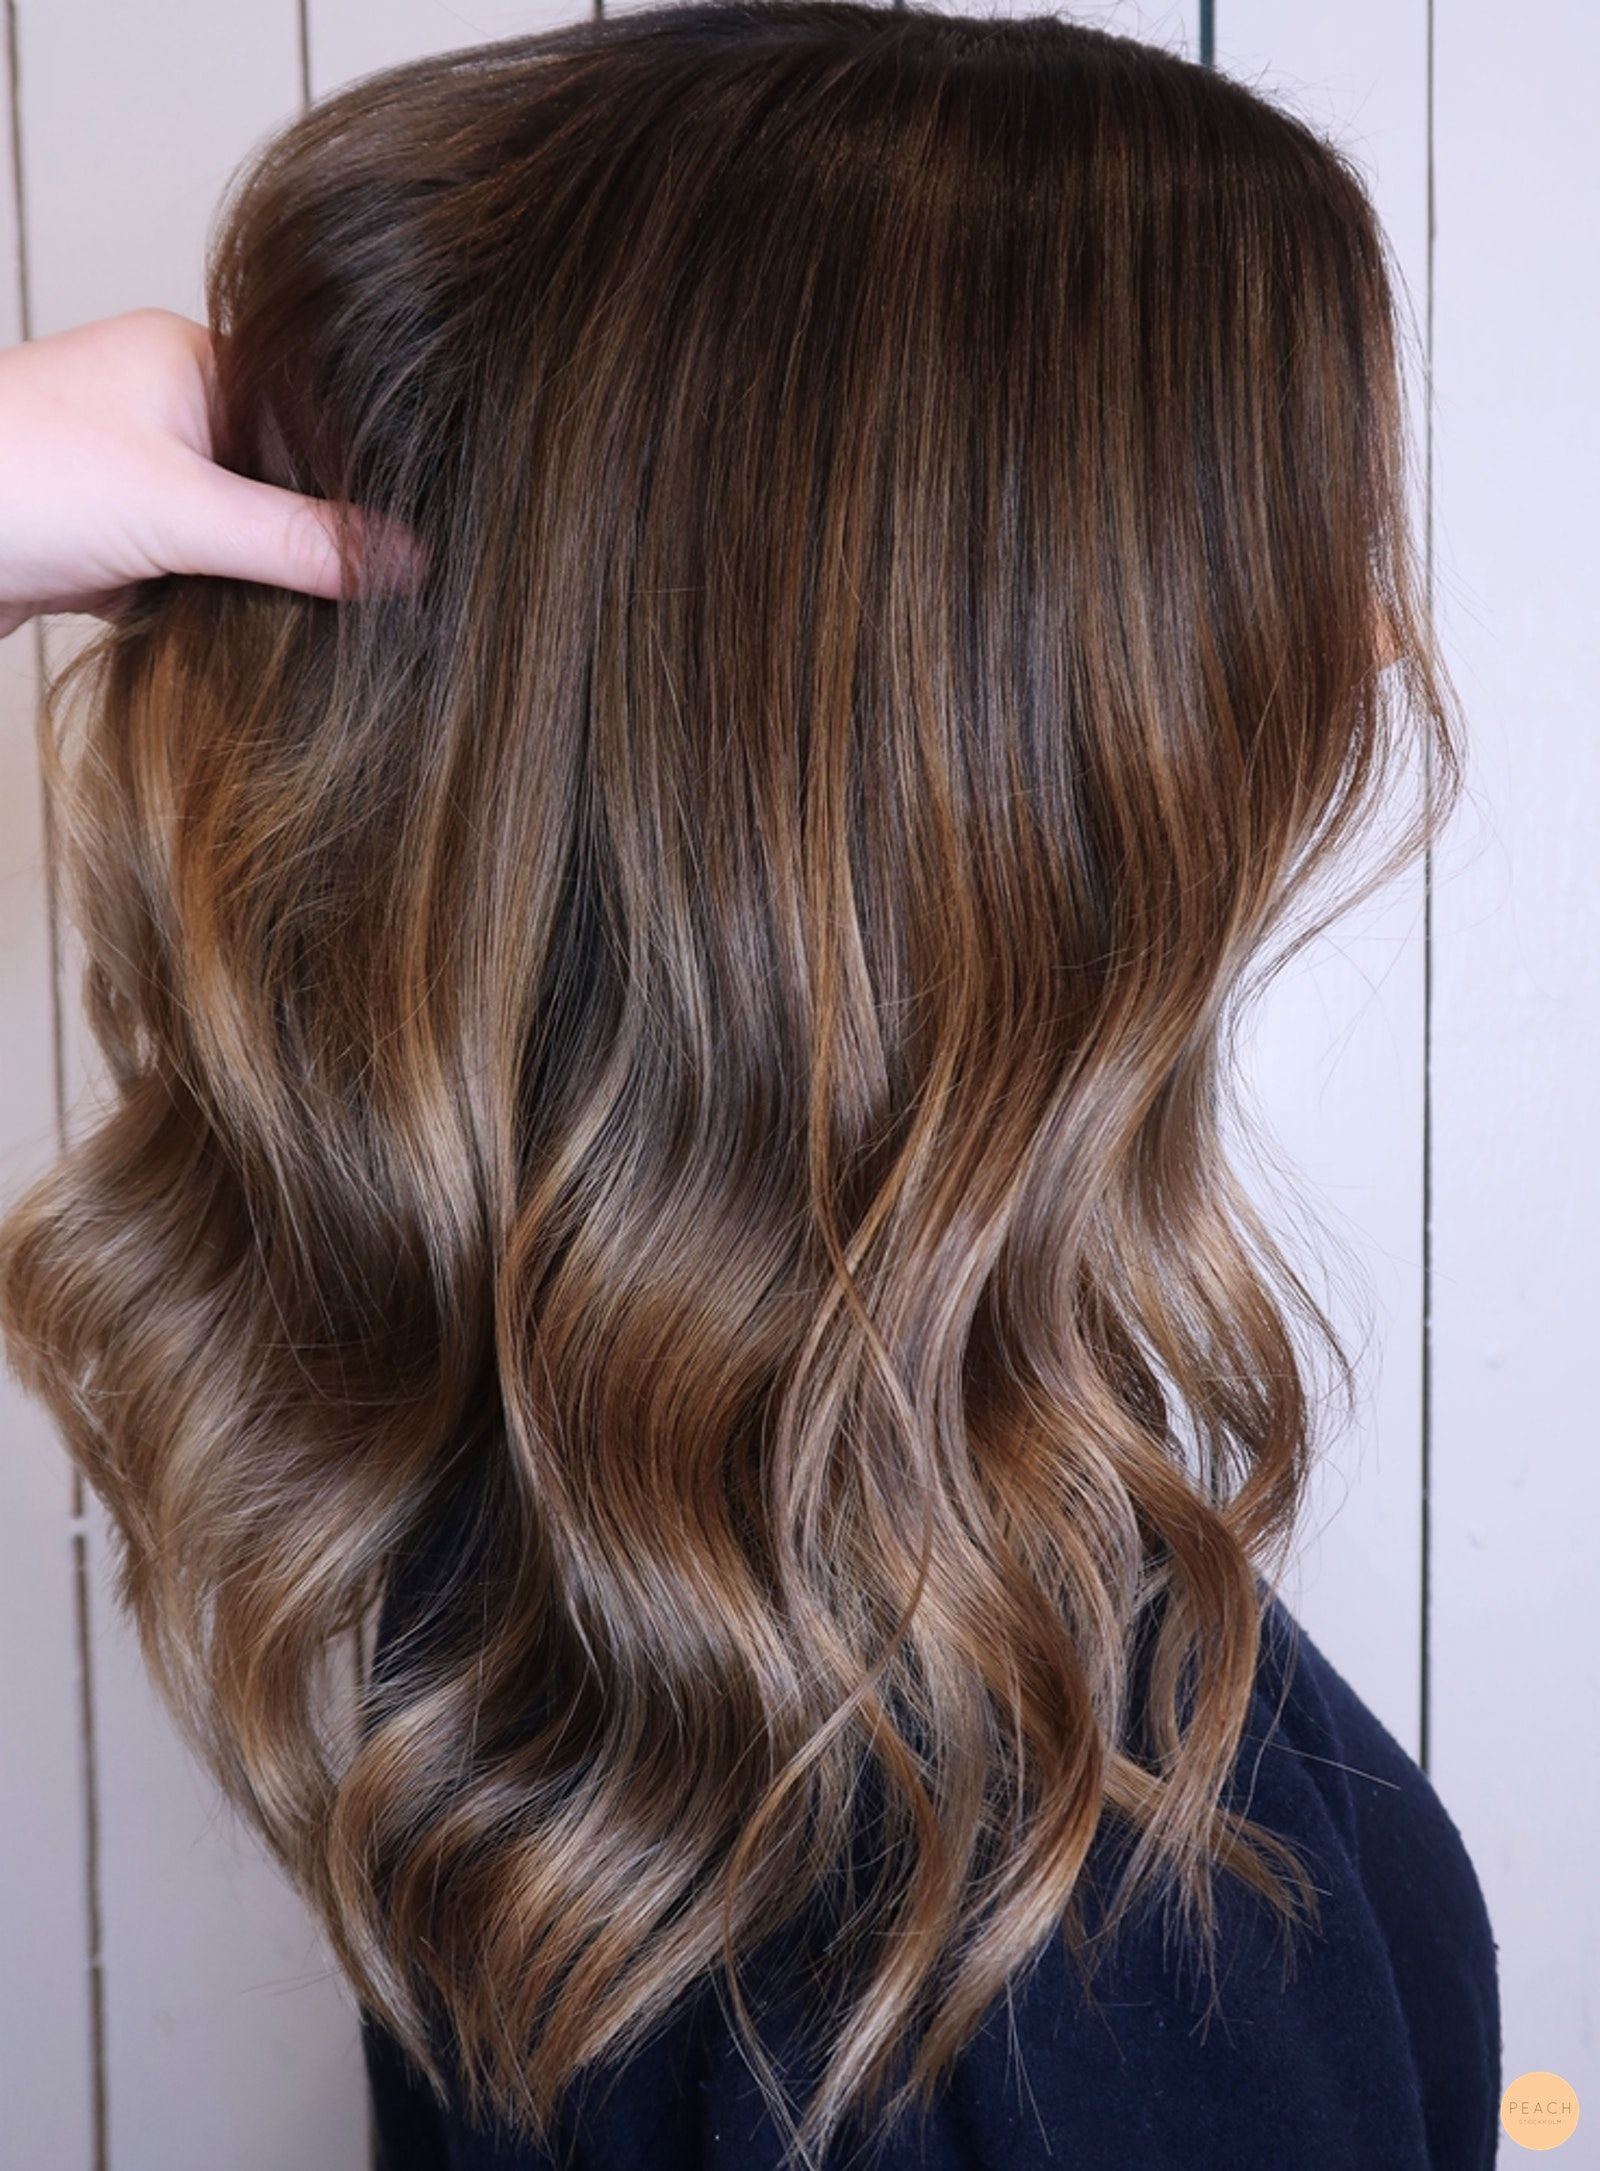 snygga slingor i mörkt hår